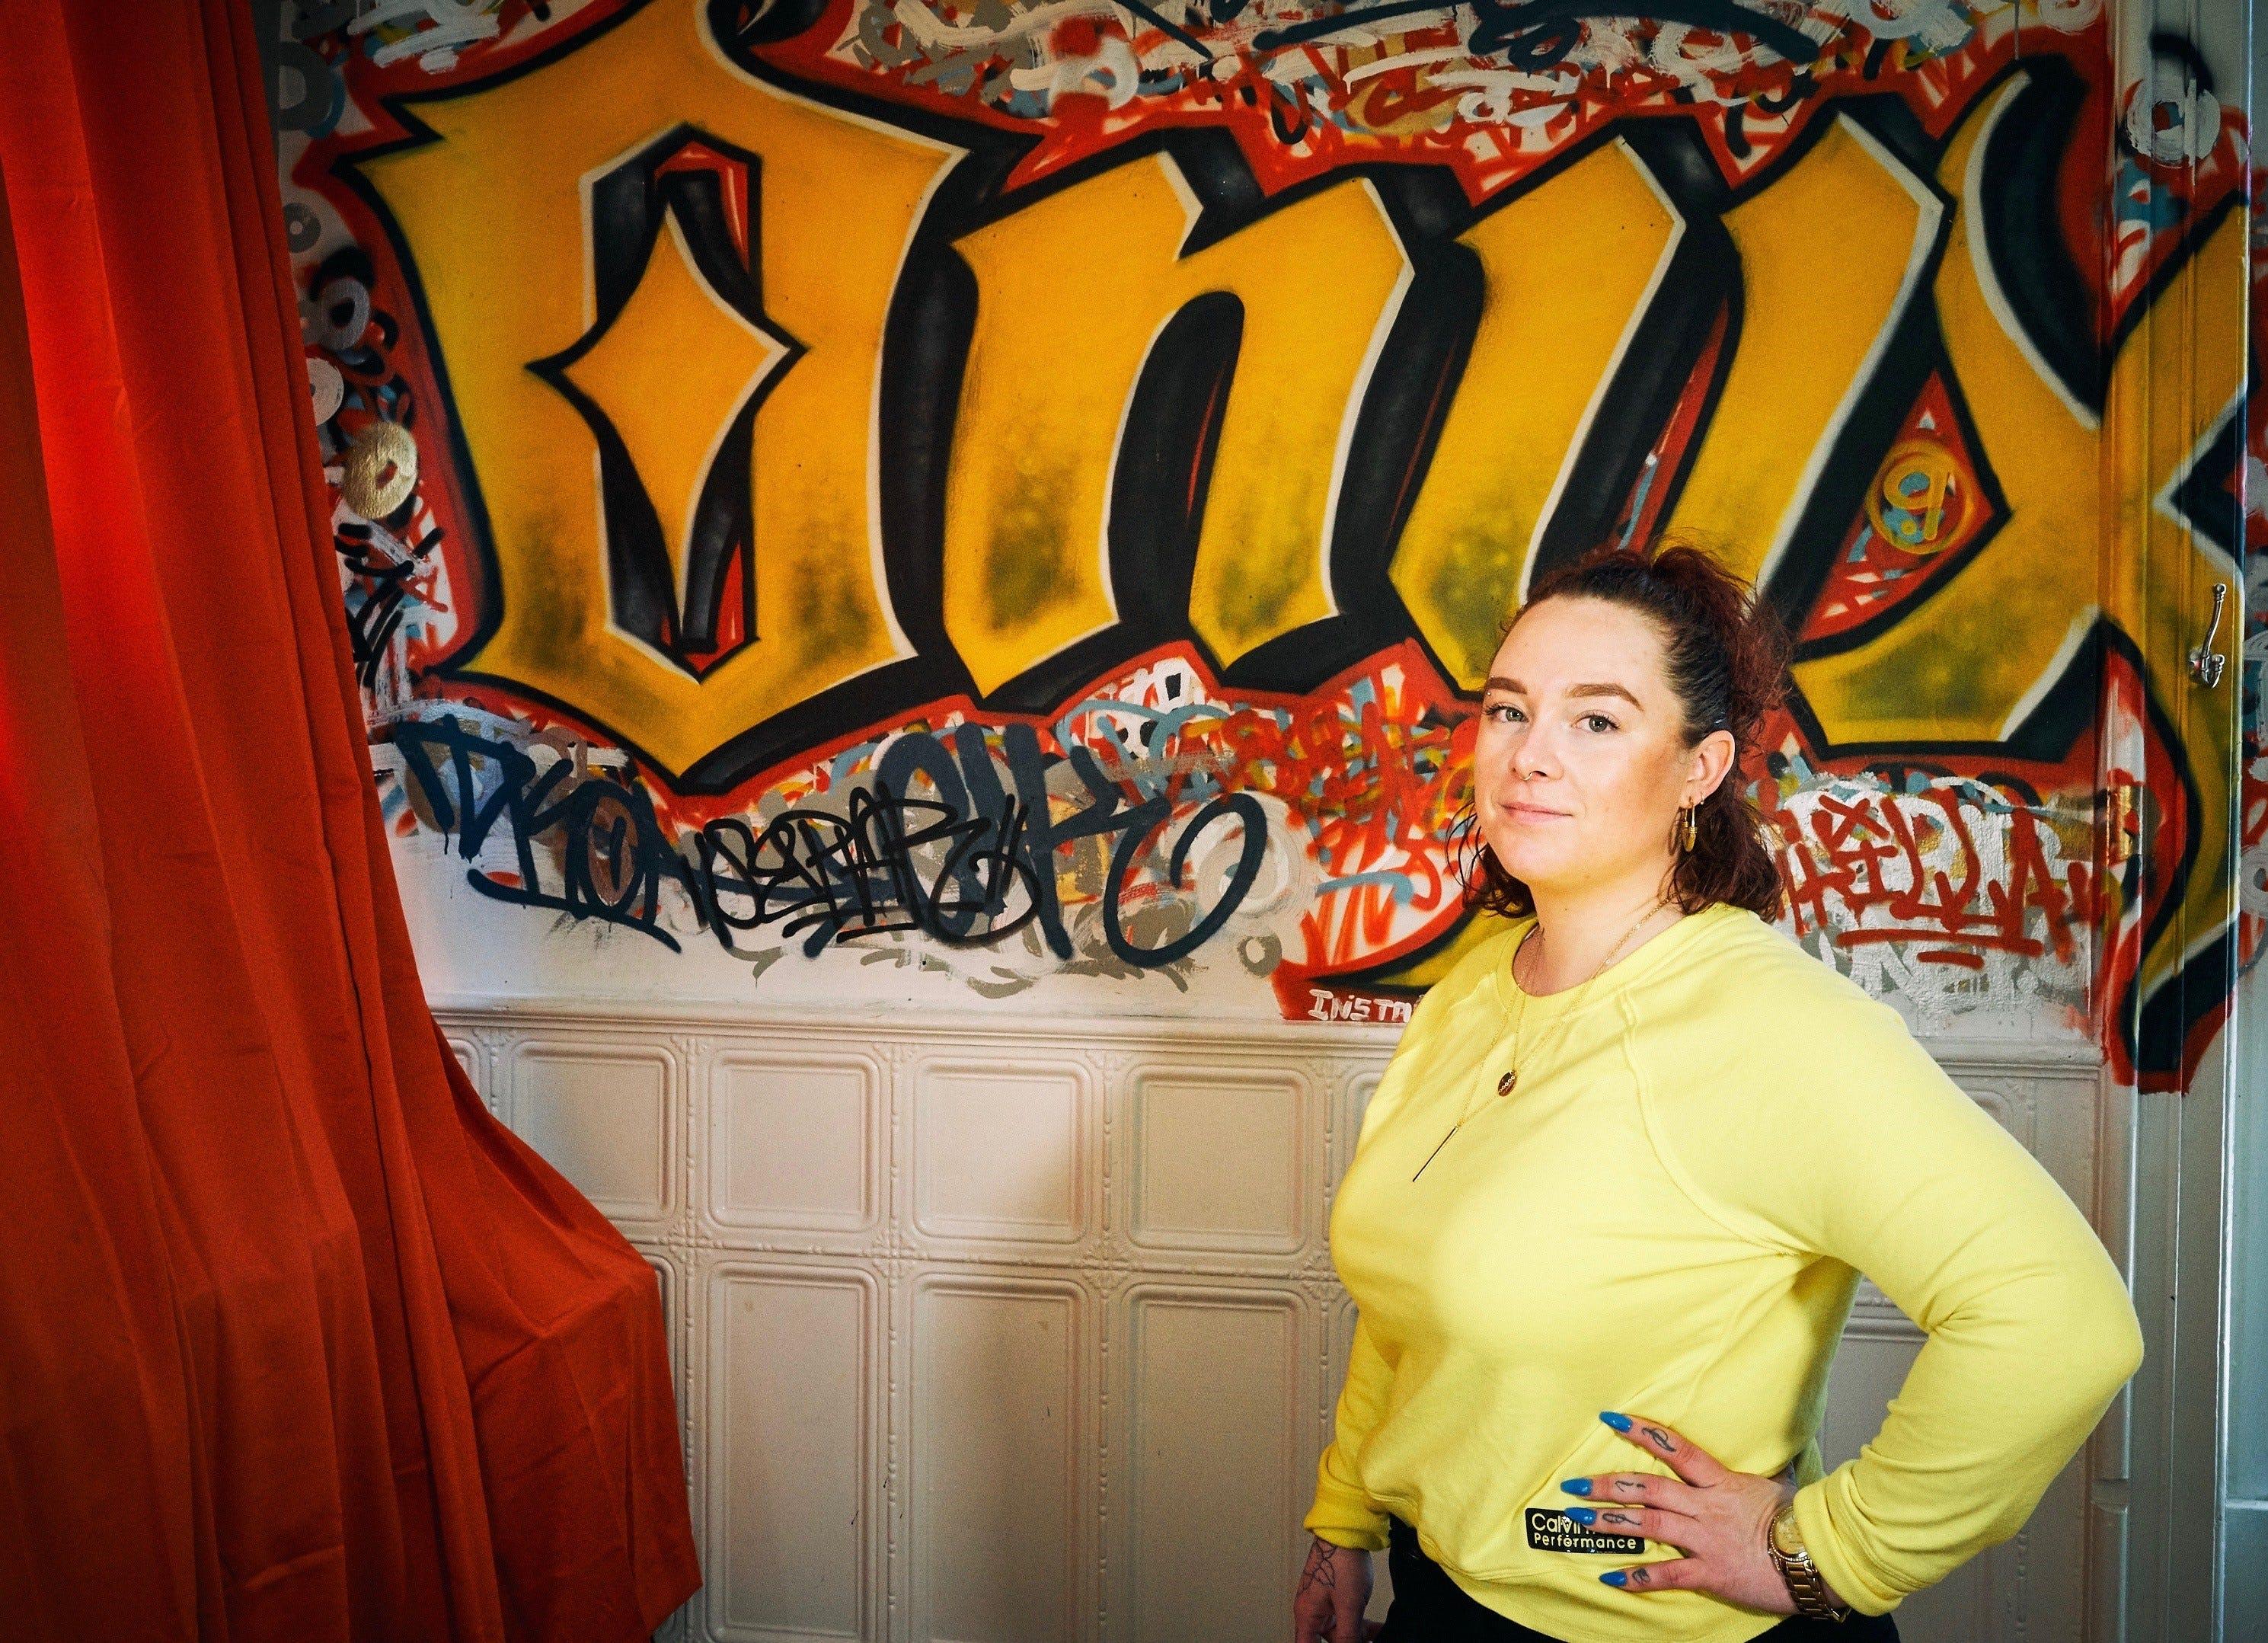 Tattoo Artist Braces For Slow Return Of Customers To Burlington Studio